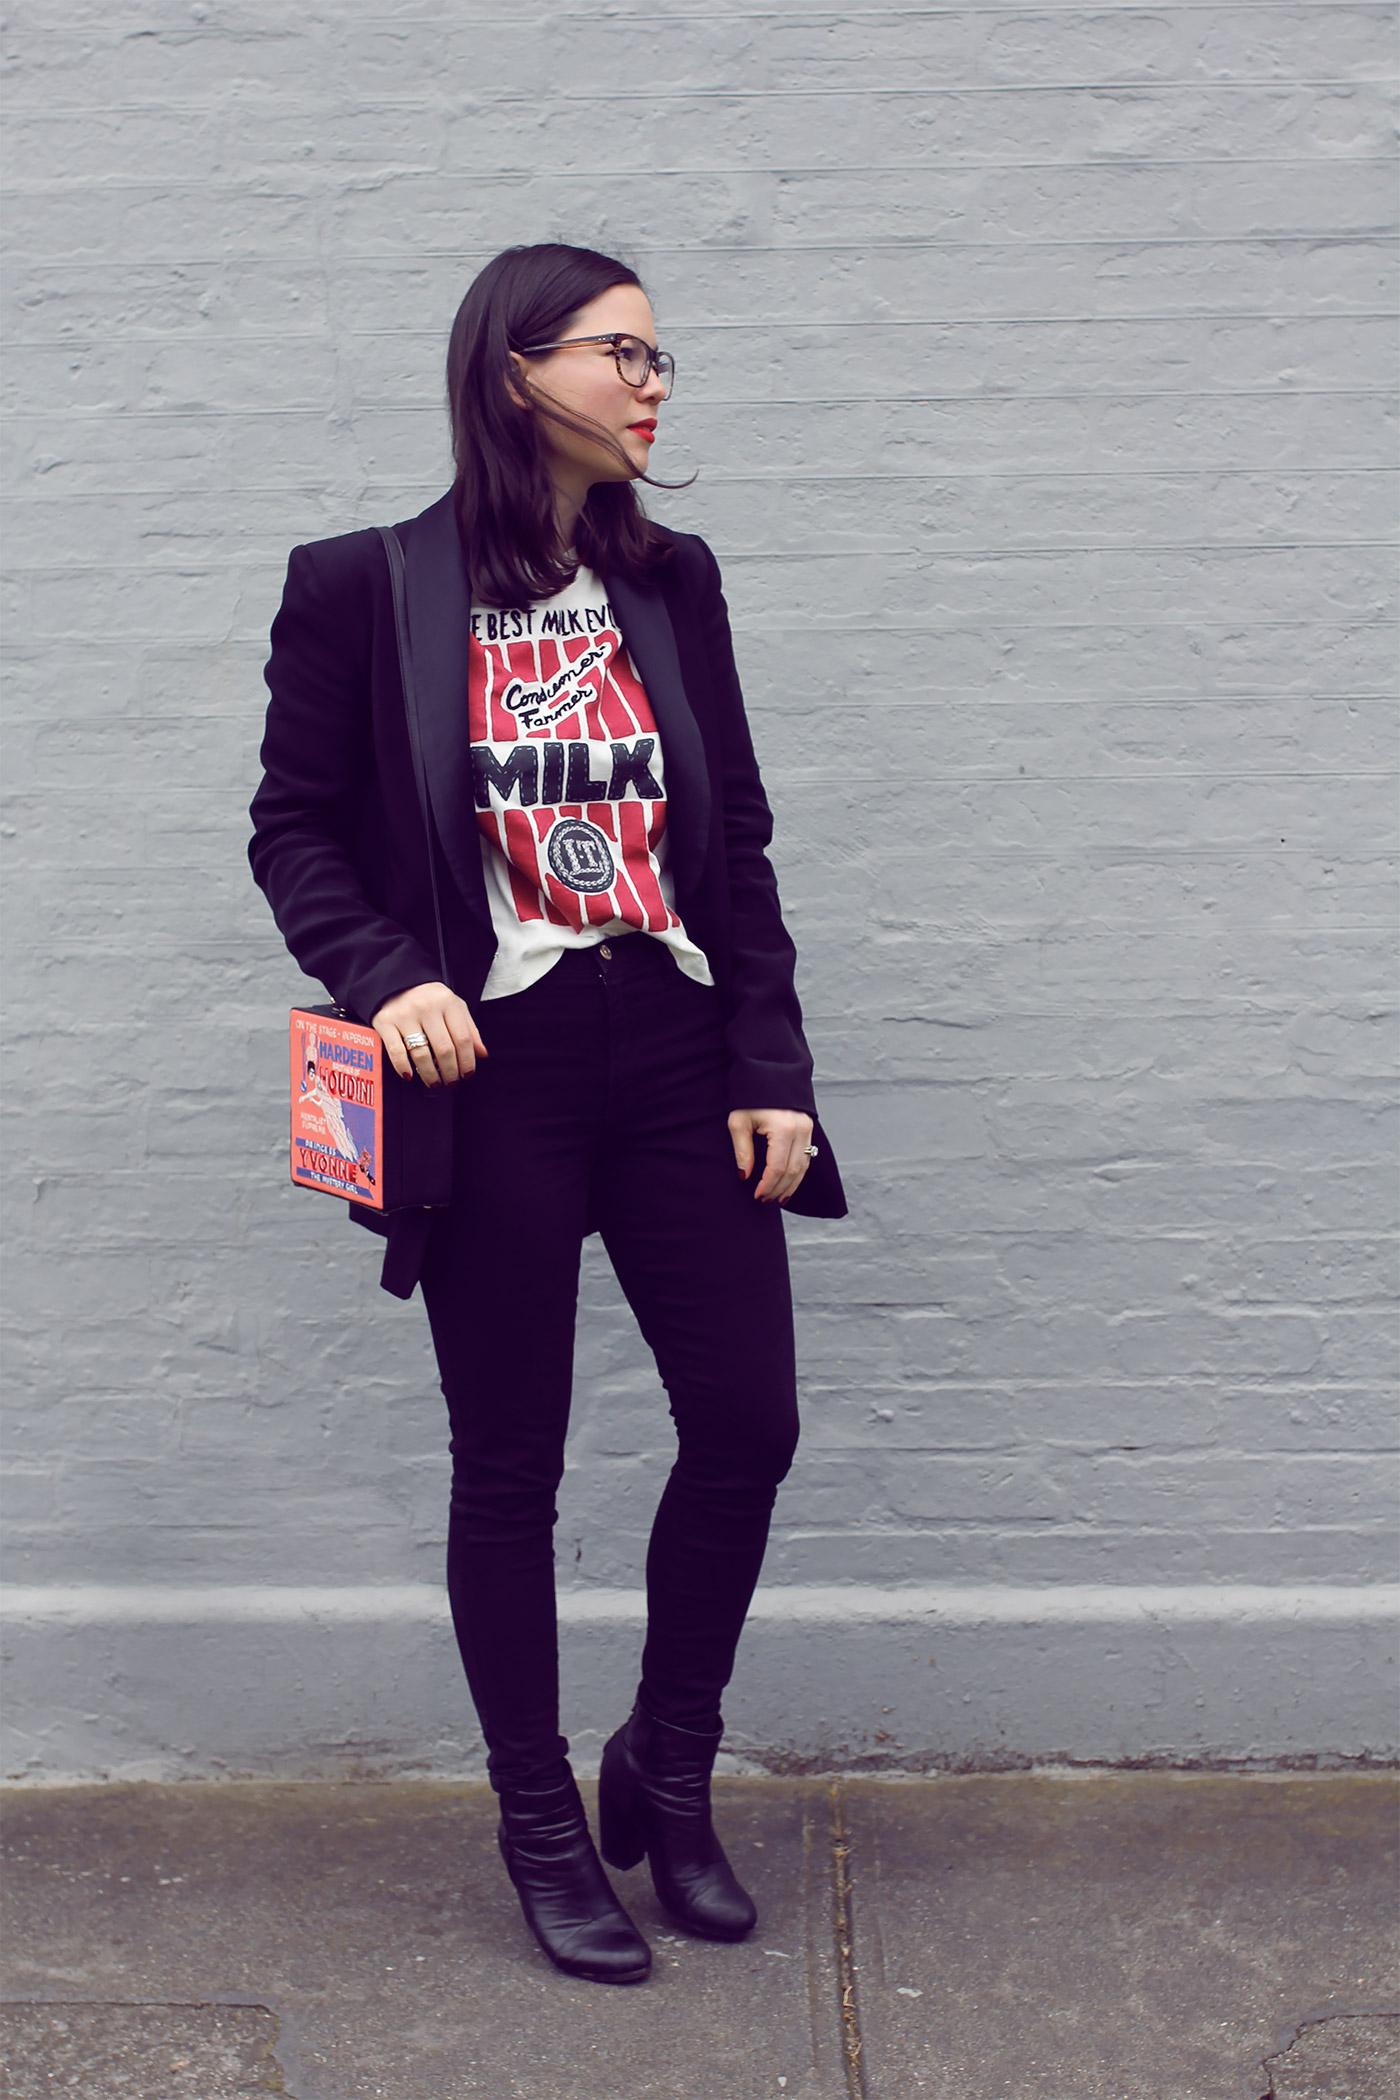 ELLERY x Specsavers Lei Lady Lei Blogger